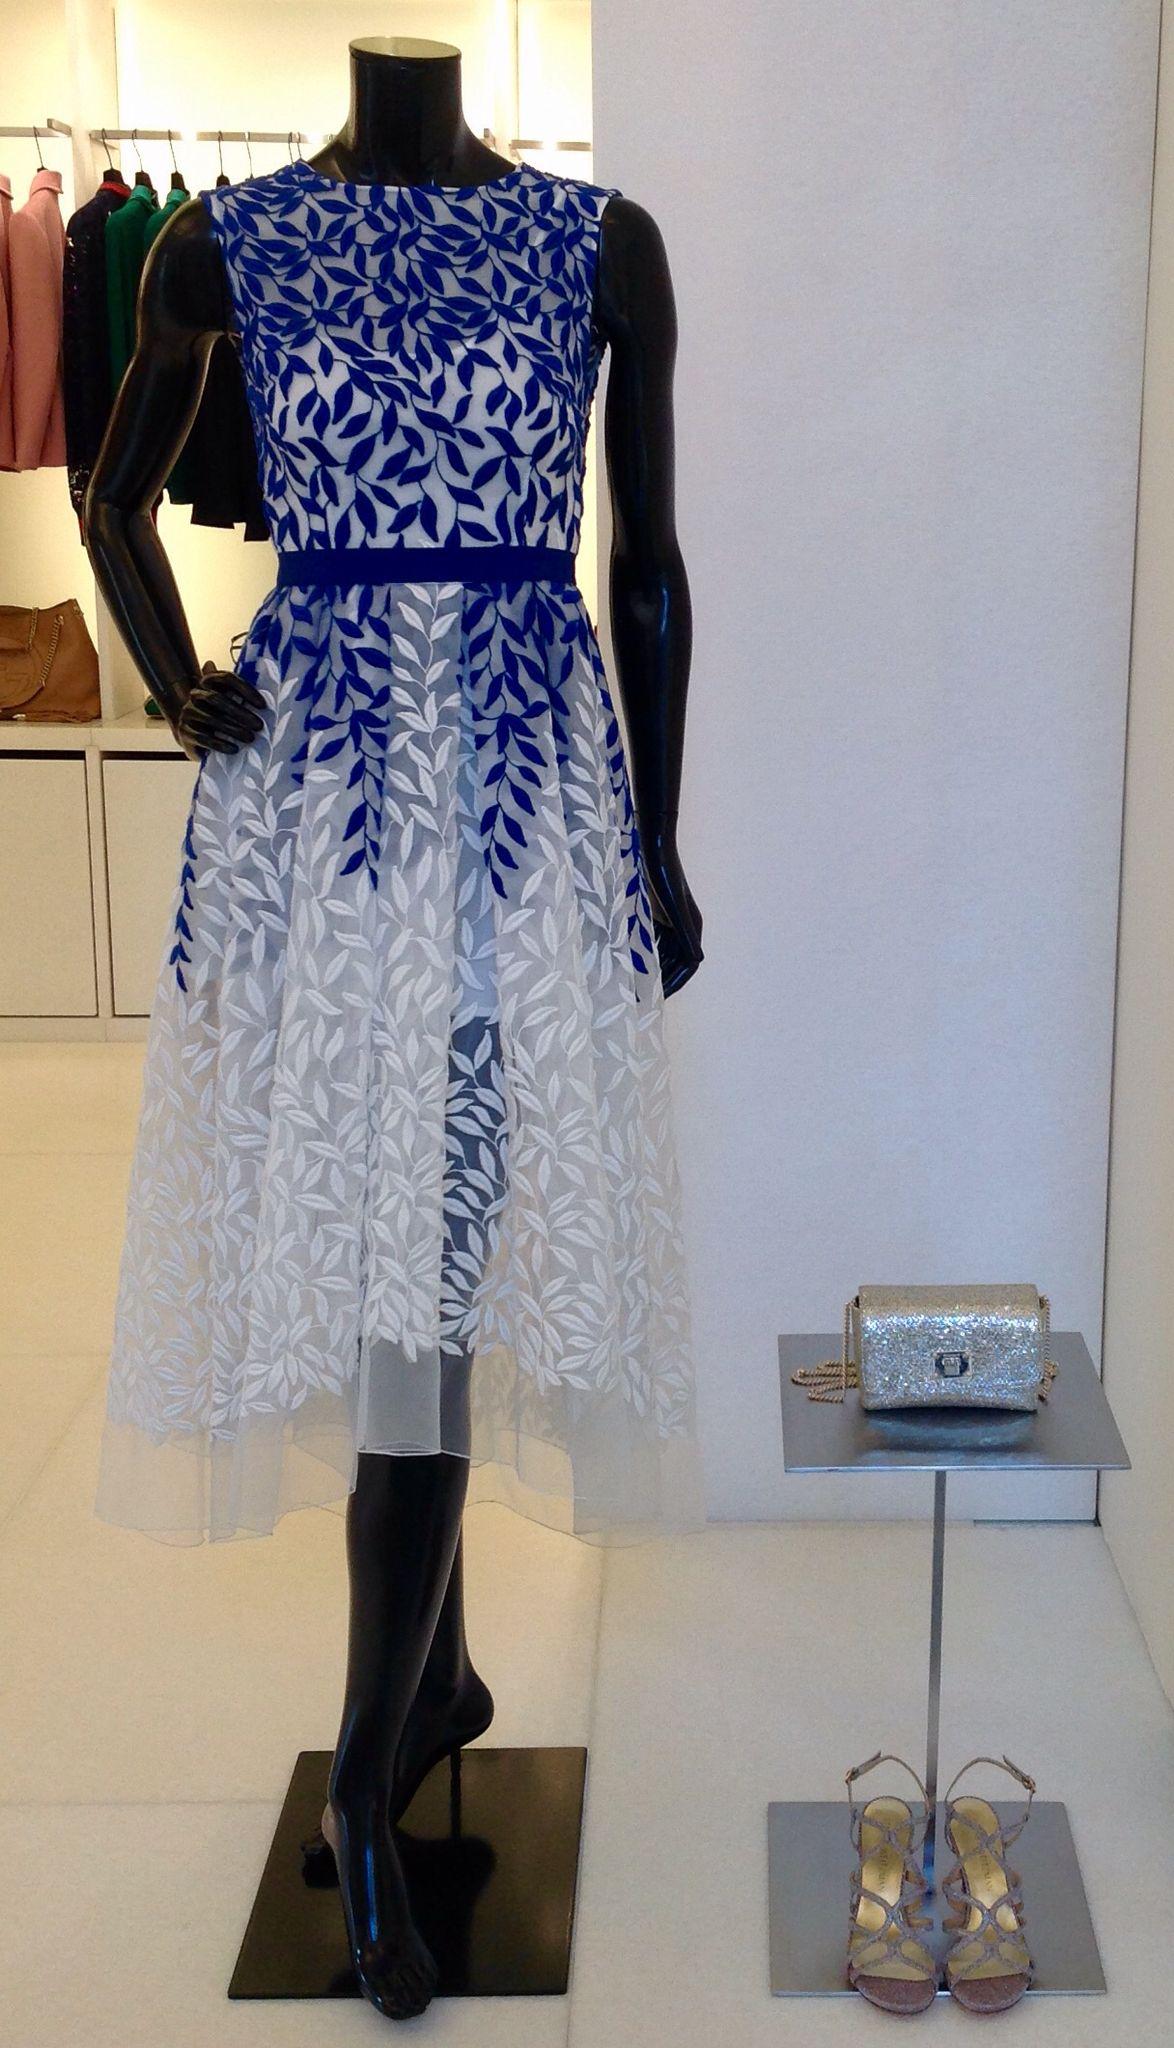 Dress by Christian Pellizzari, bag by Jimmy Choo and shoes by Stuart Weitzman at #ilduomonovara